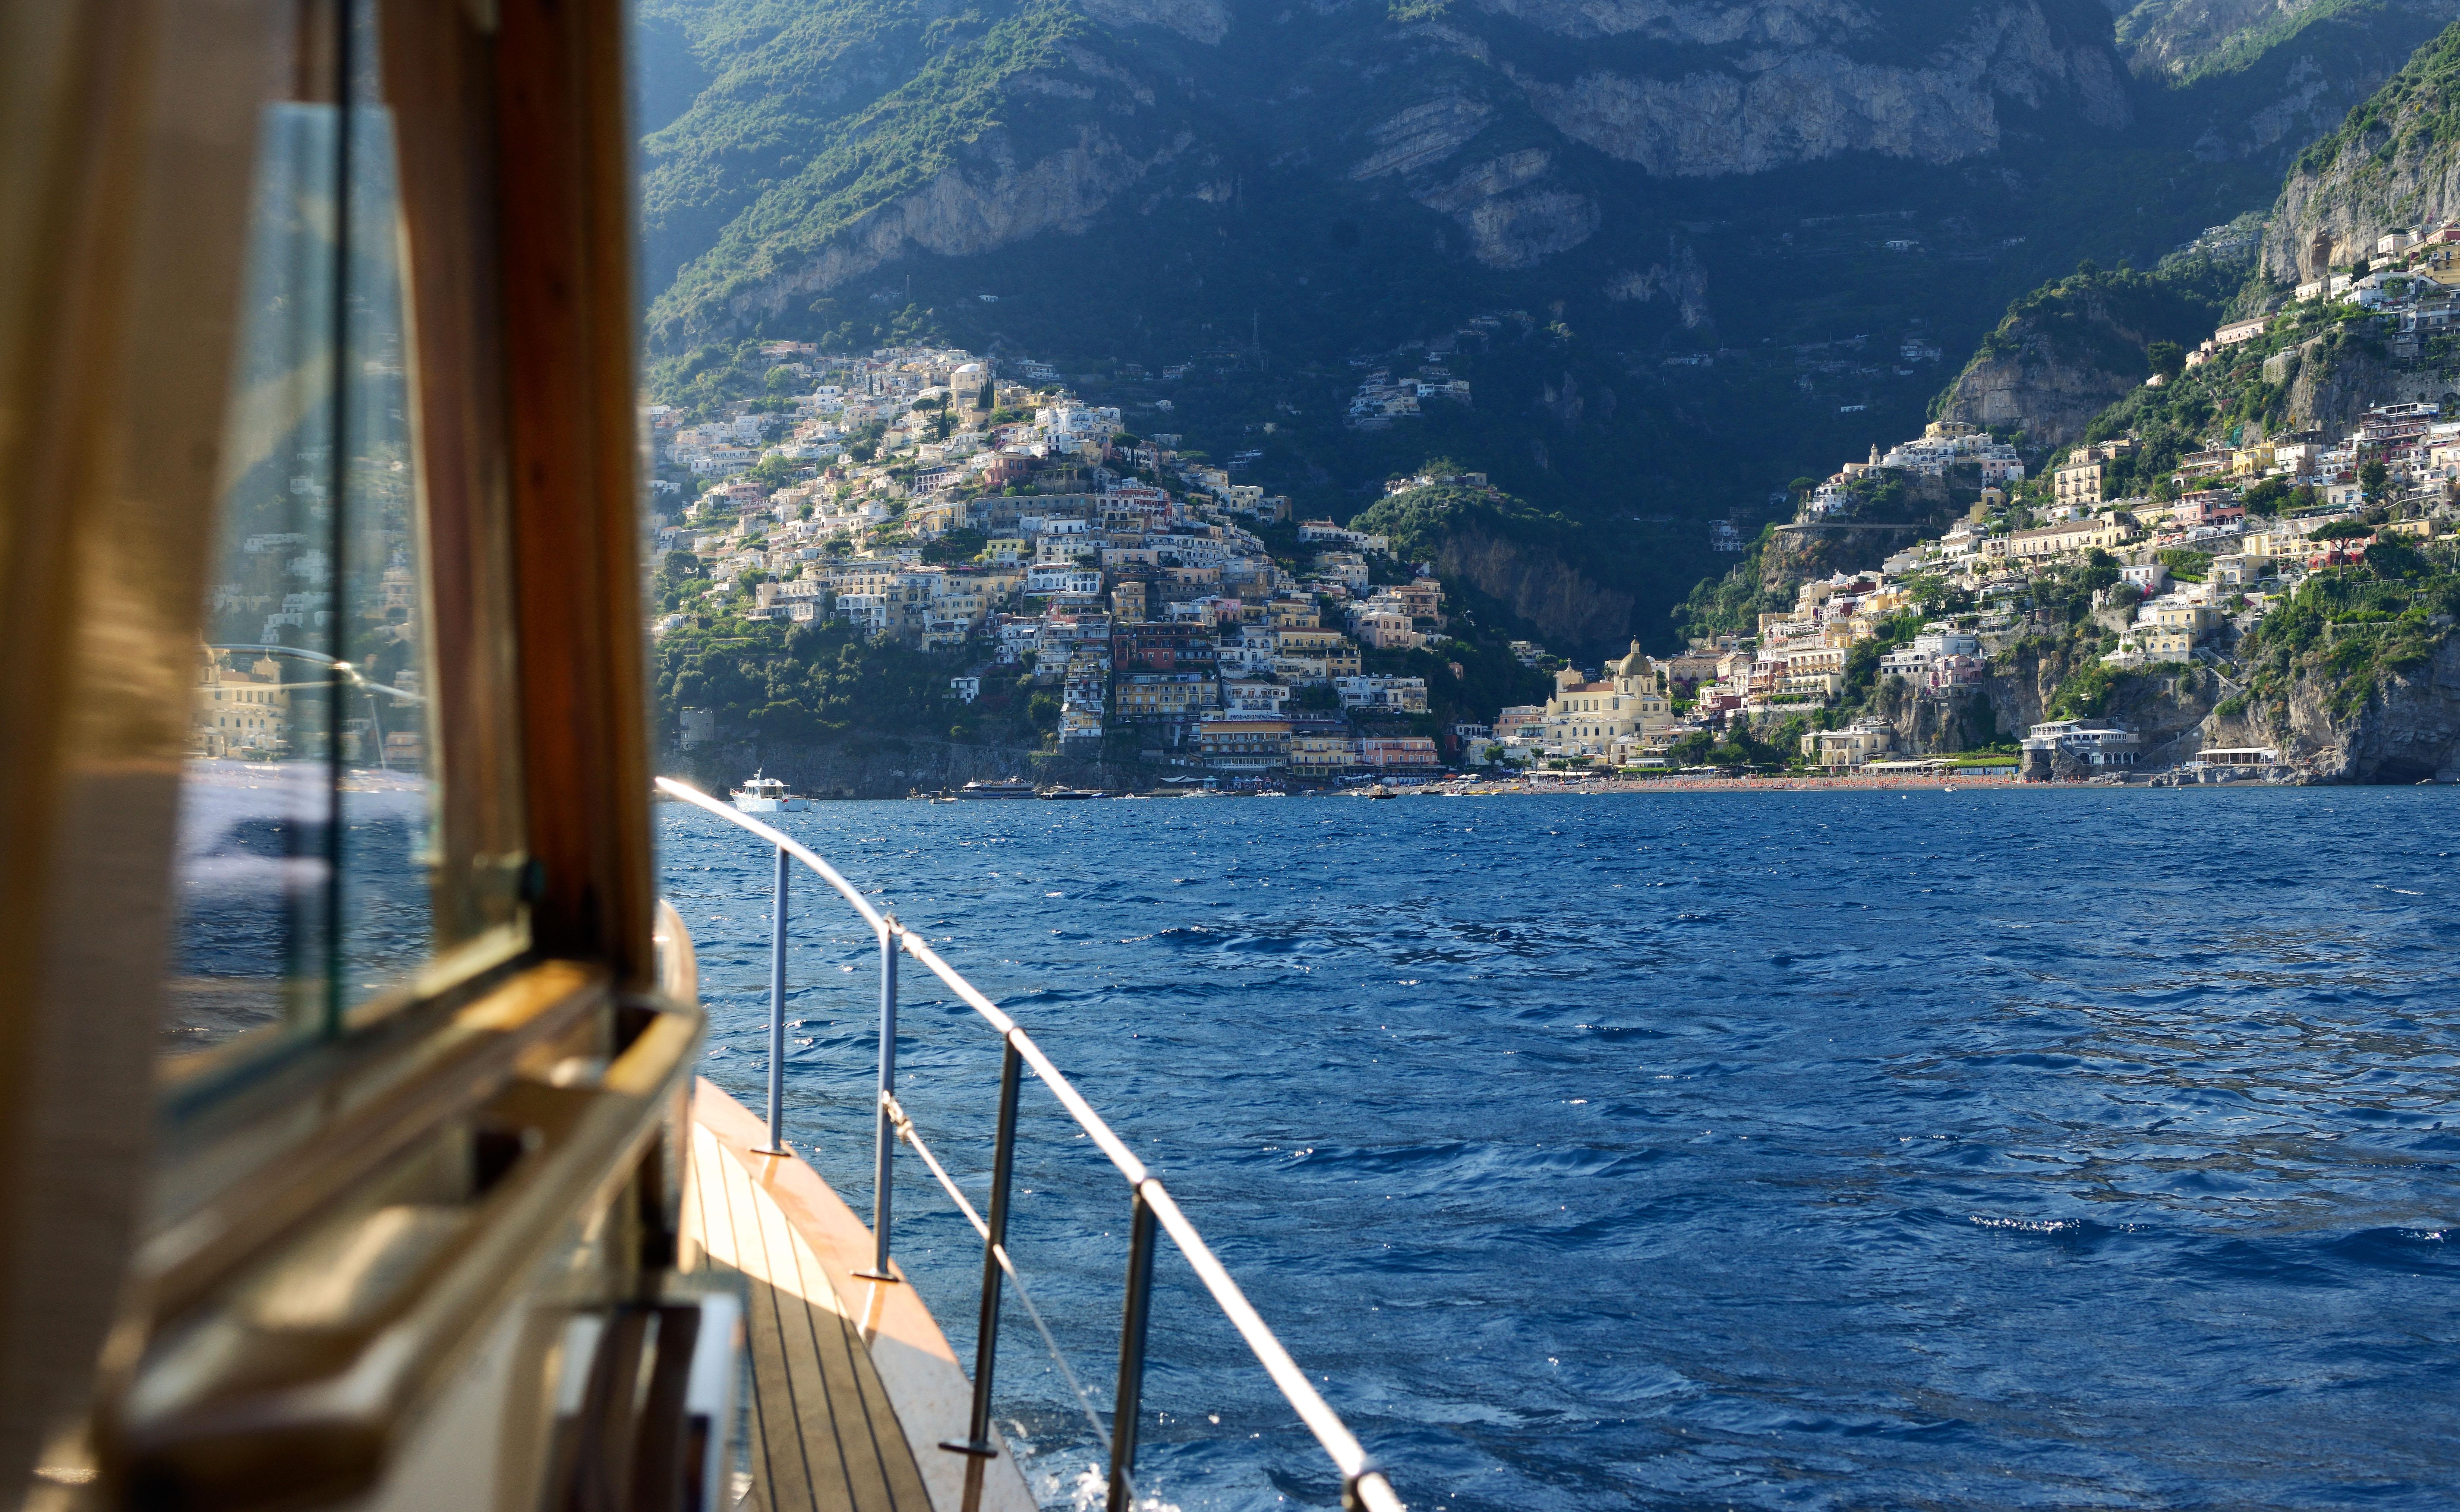 Amalfi_Capri_Tourissimo_2.jpg